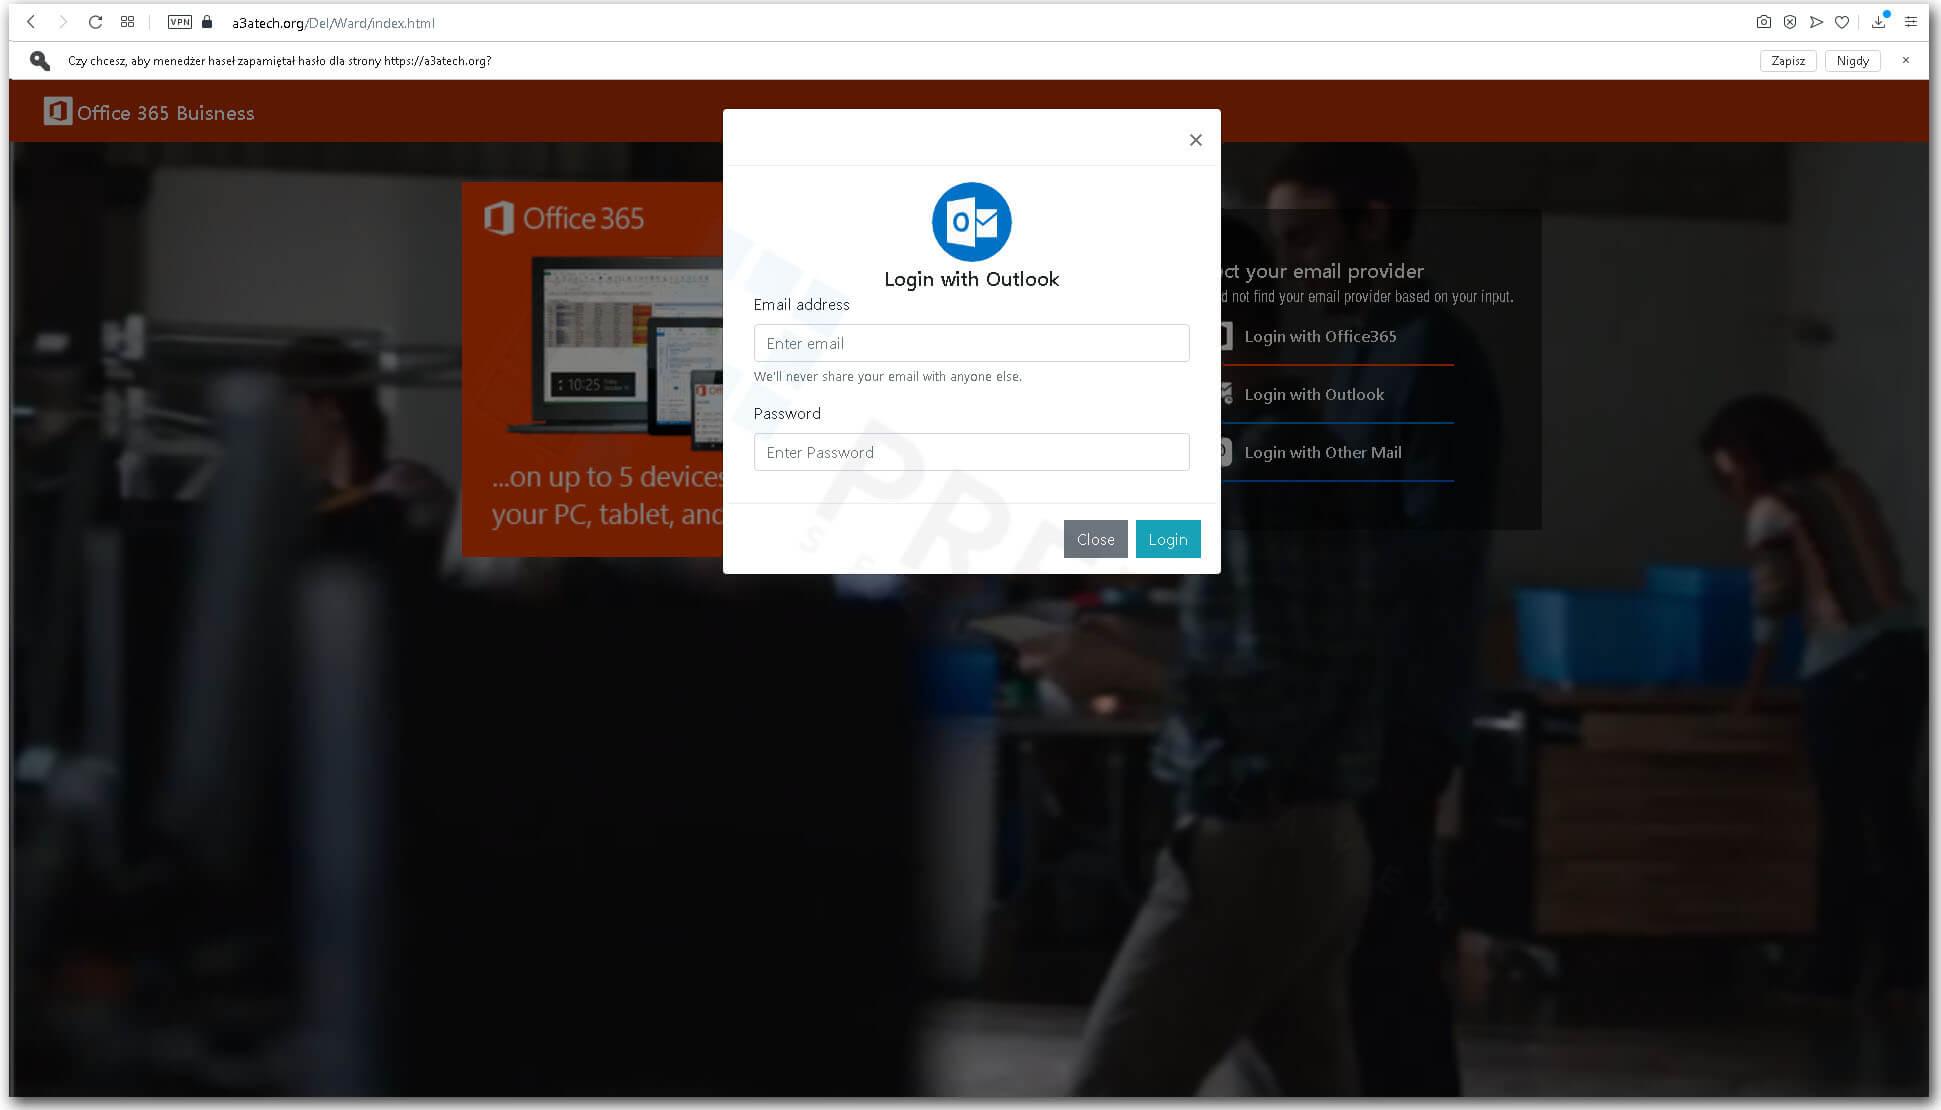 Okno logowania do klienta pocztowegoOutlook